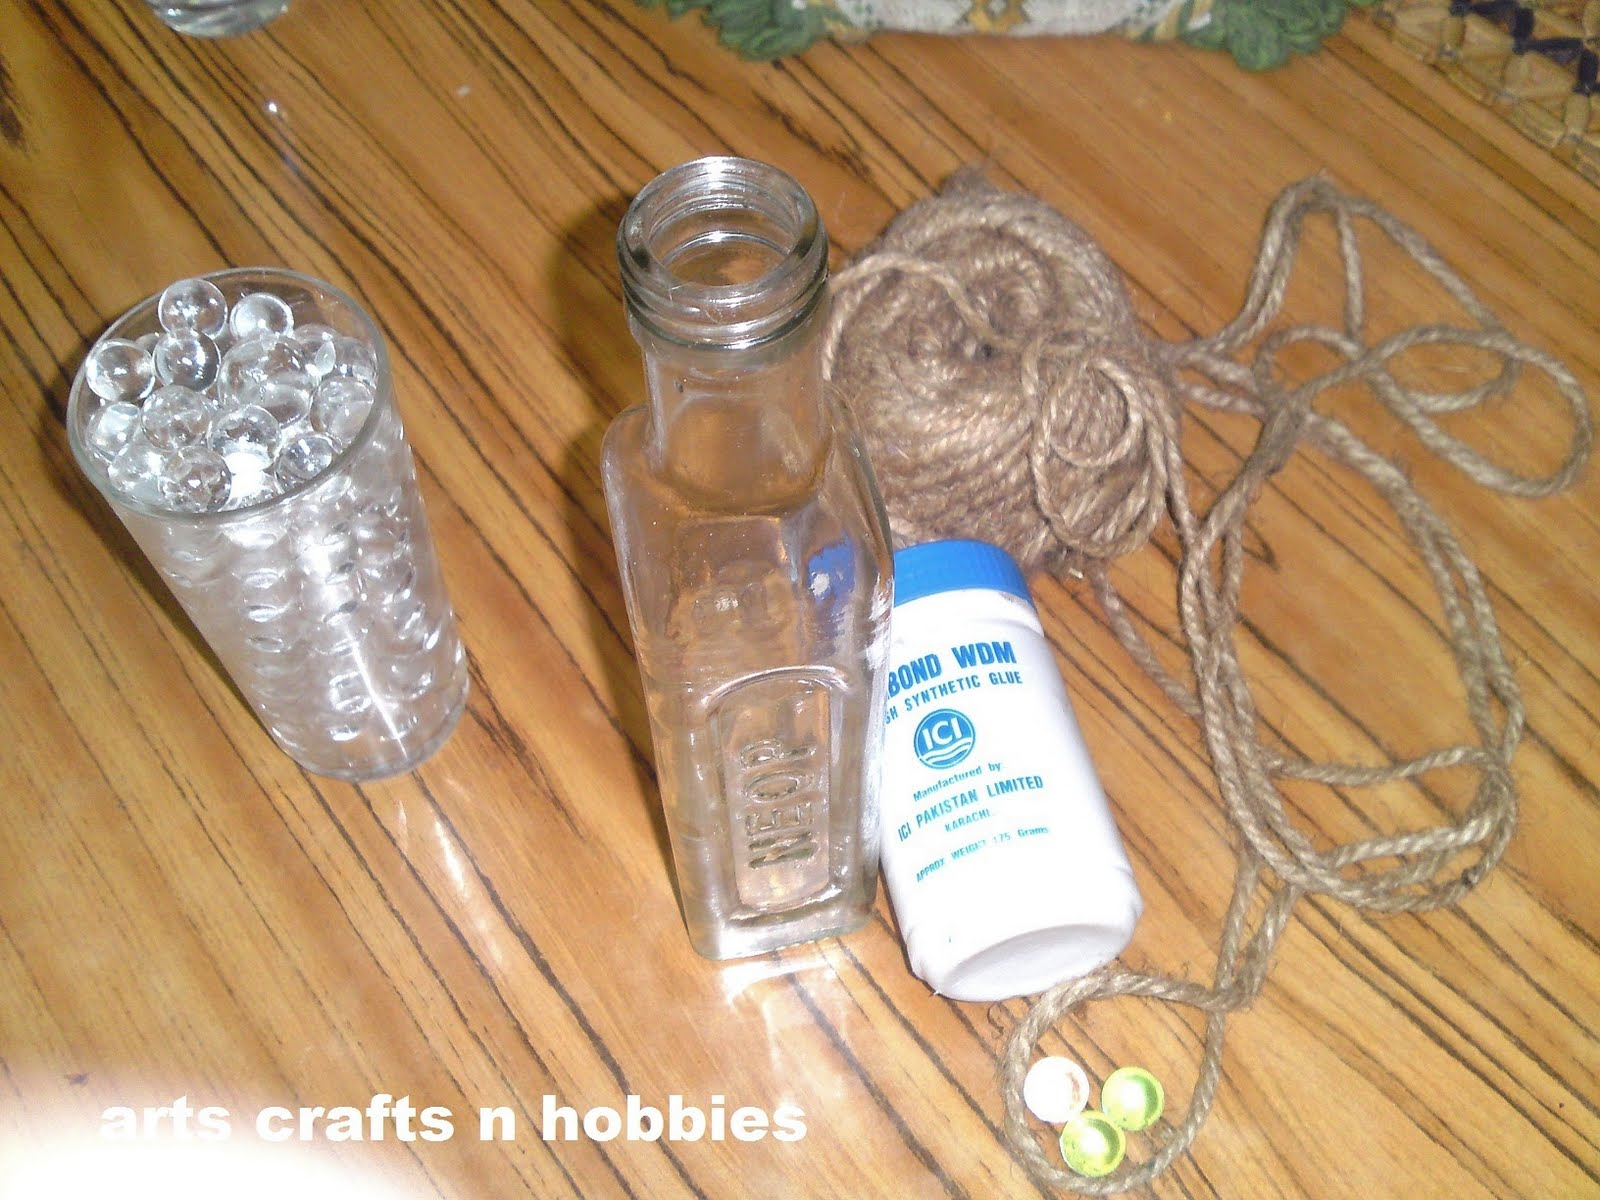 Arts crafts n hobbies empty olive oil bottle decore tutorial for Glass bottle crafts to make